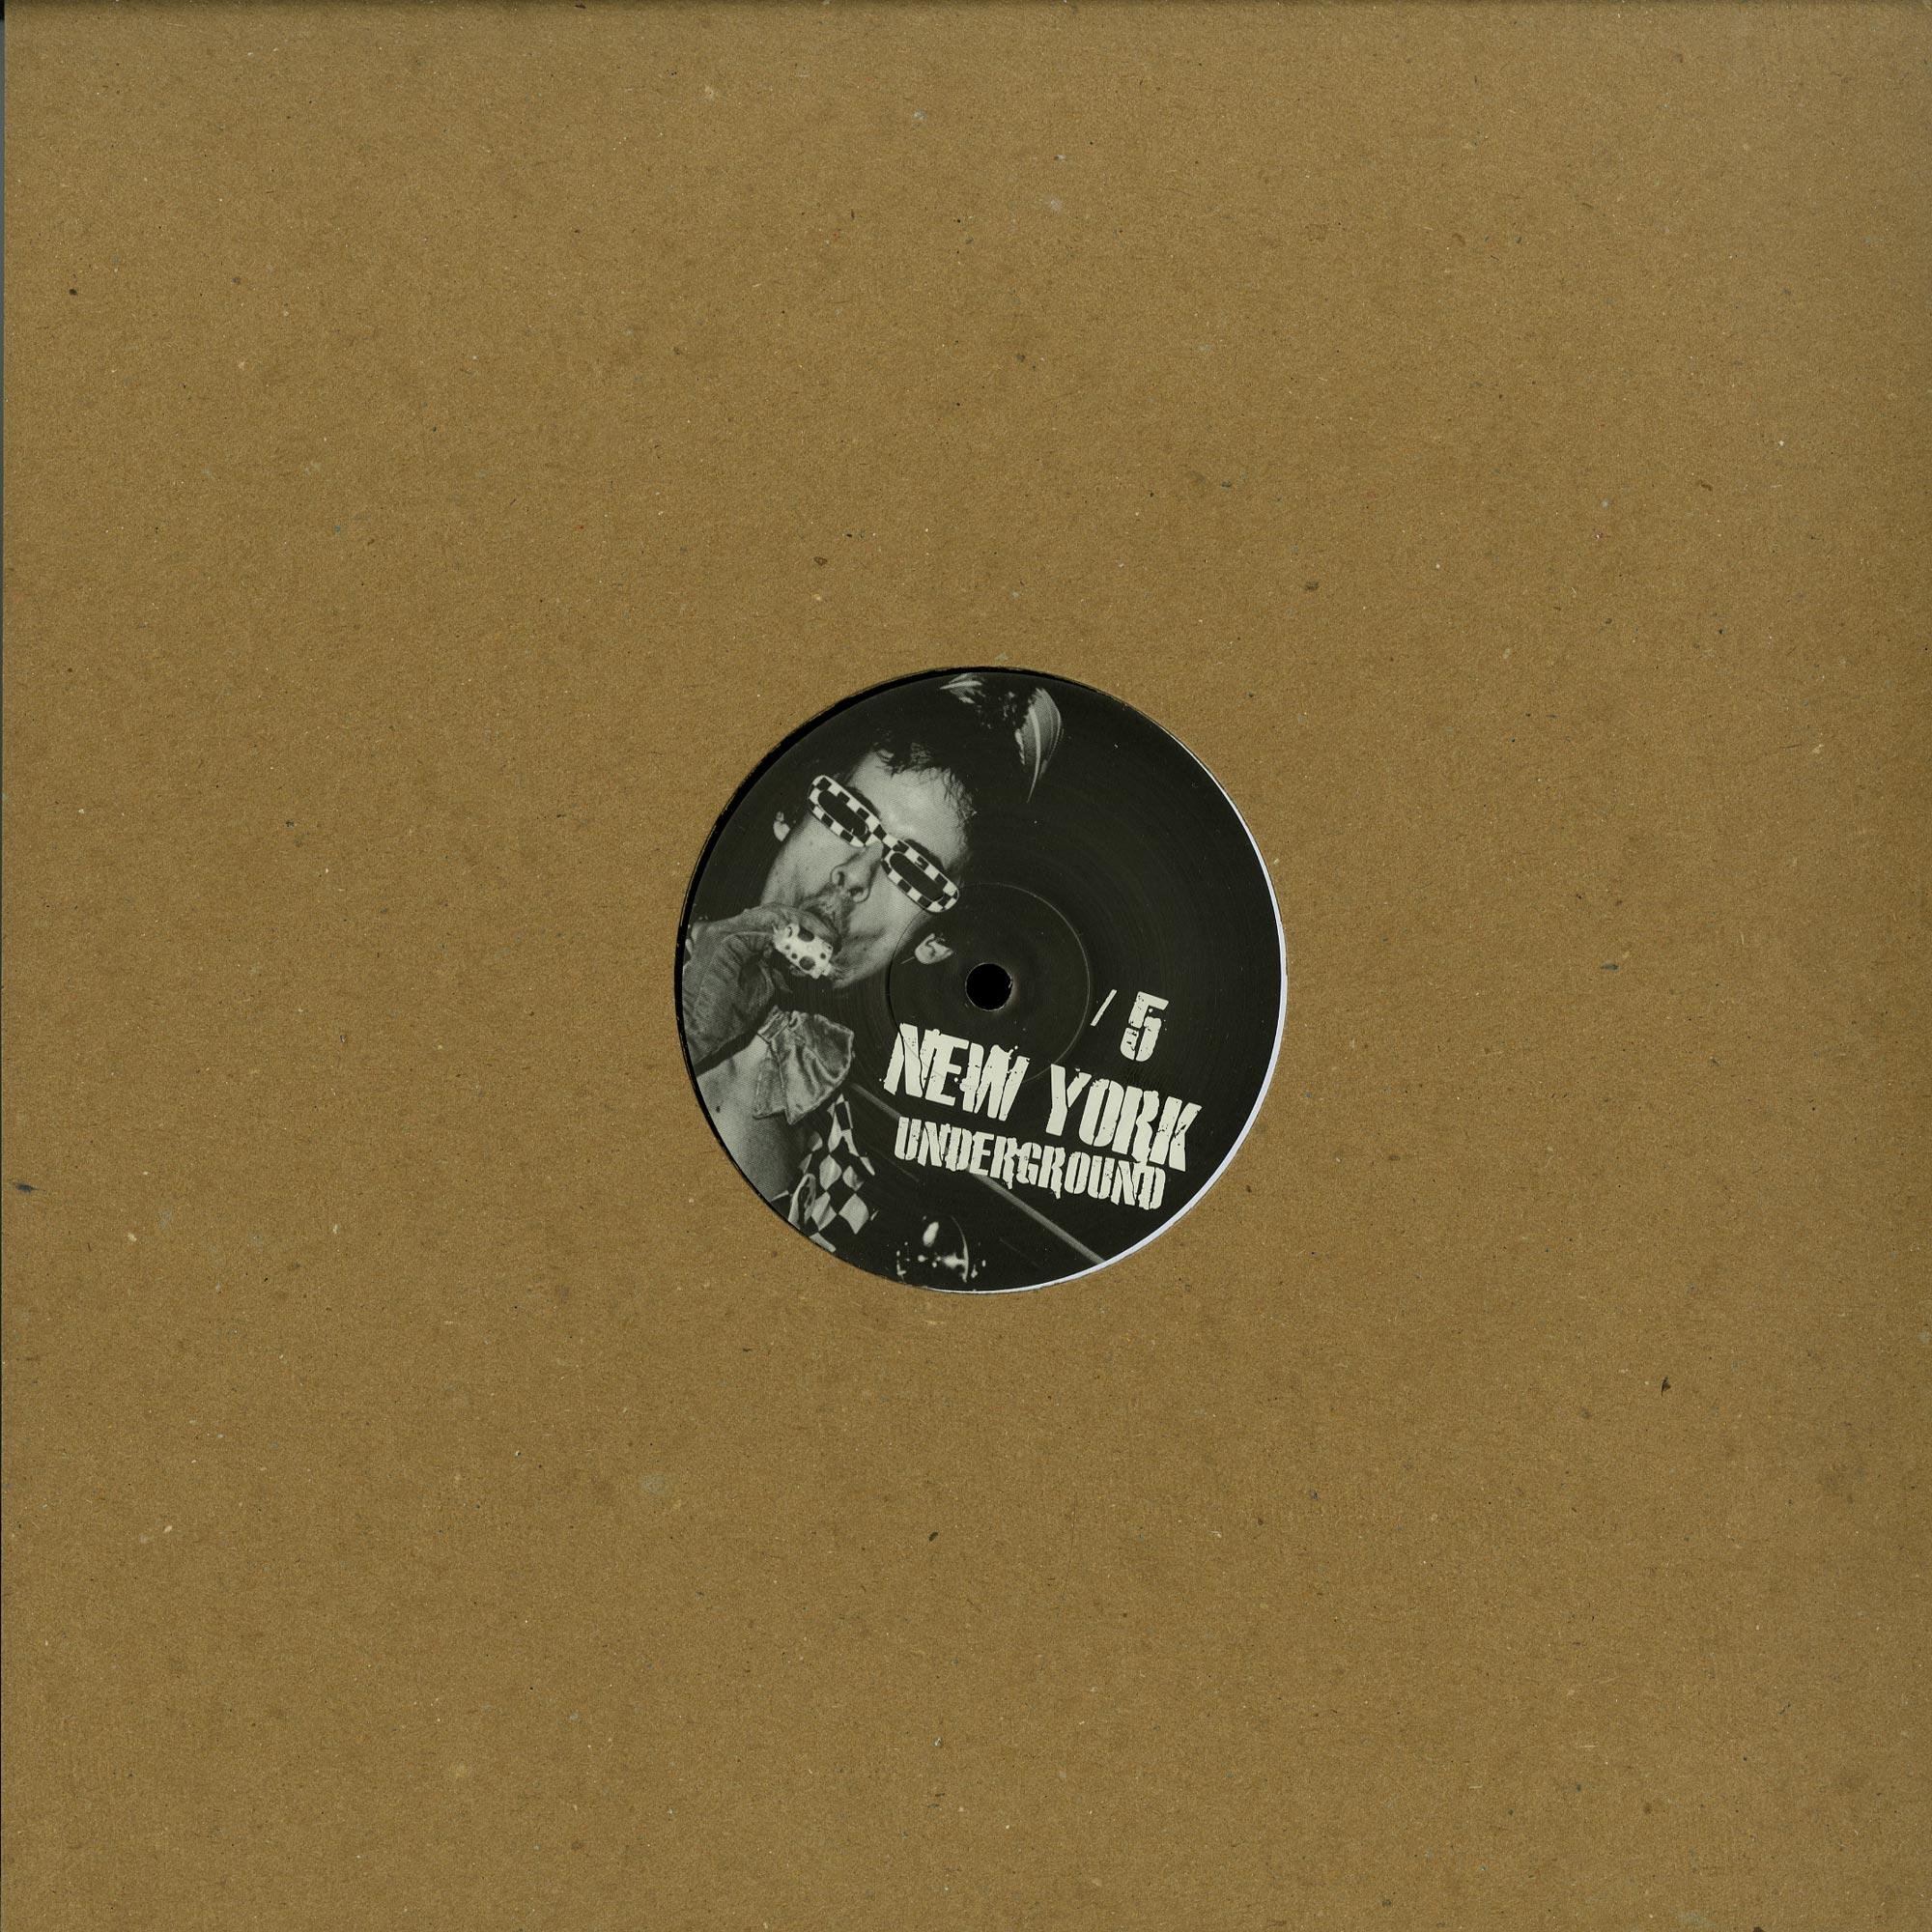 Various Artists - NEW YORK UNDERGROUND 5